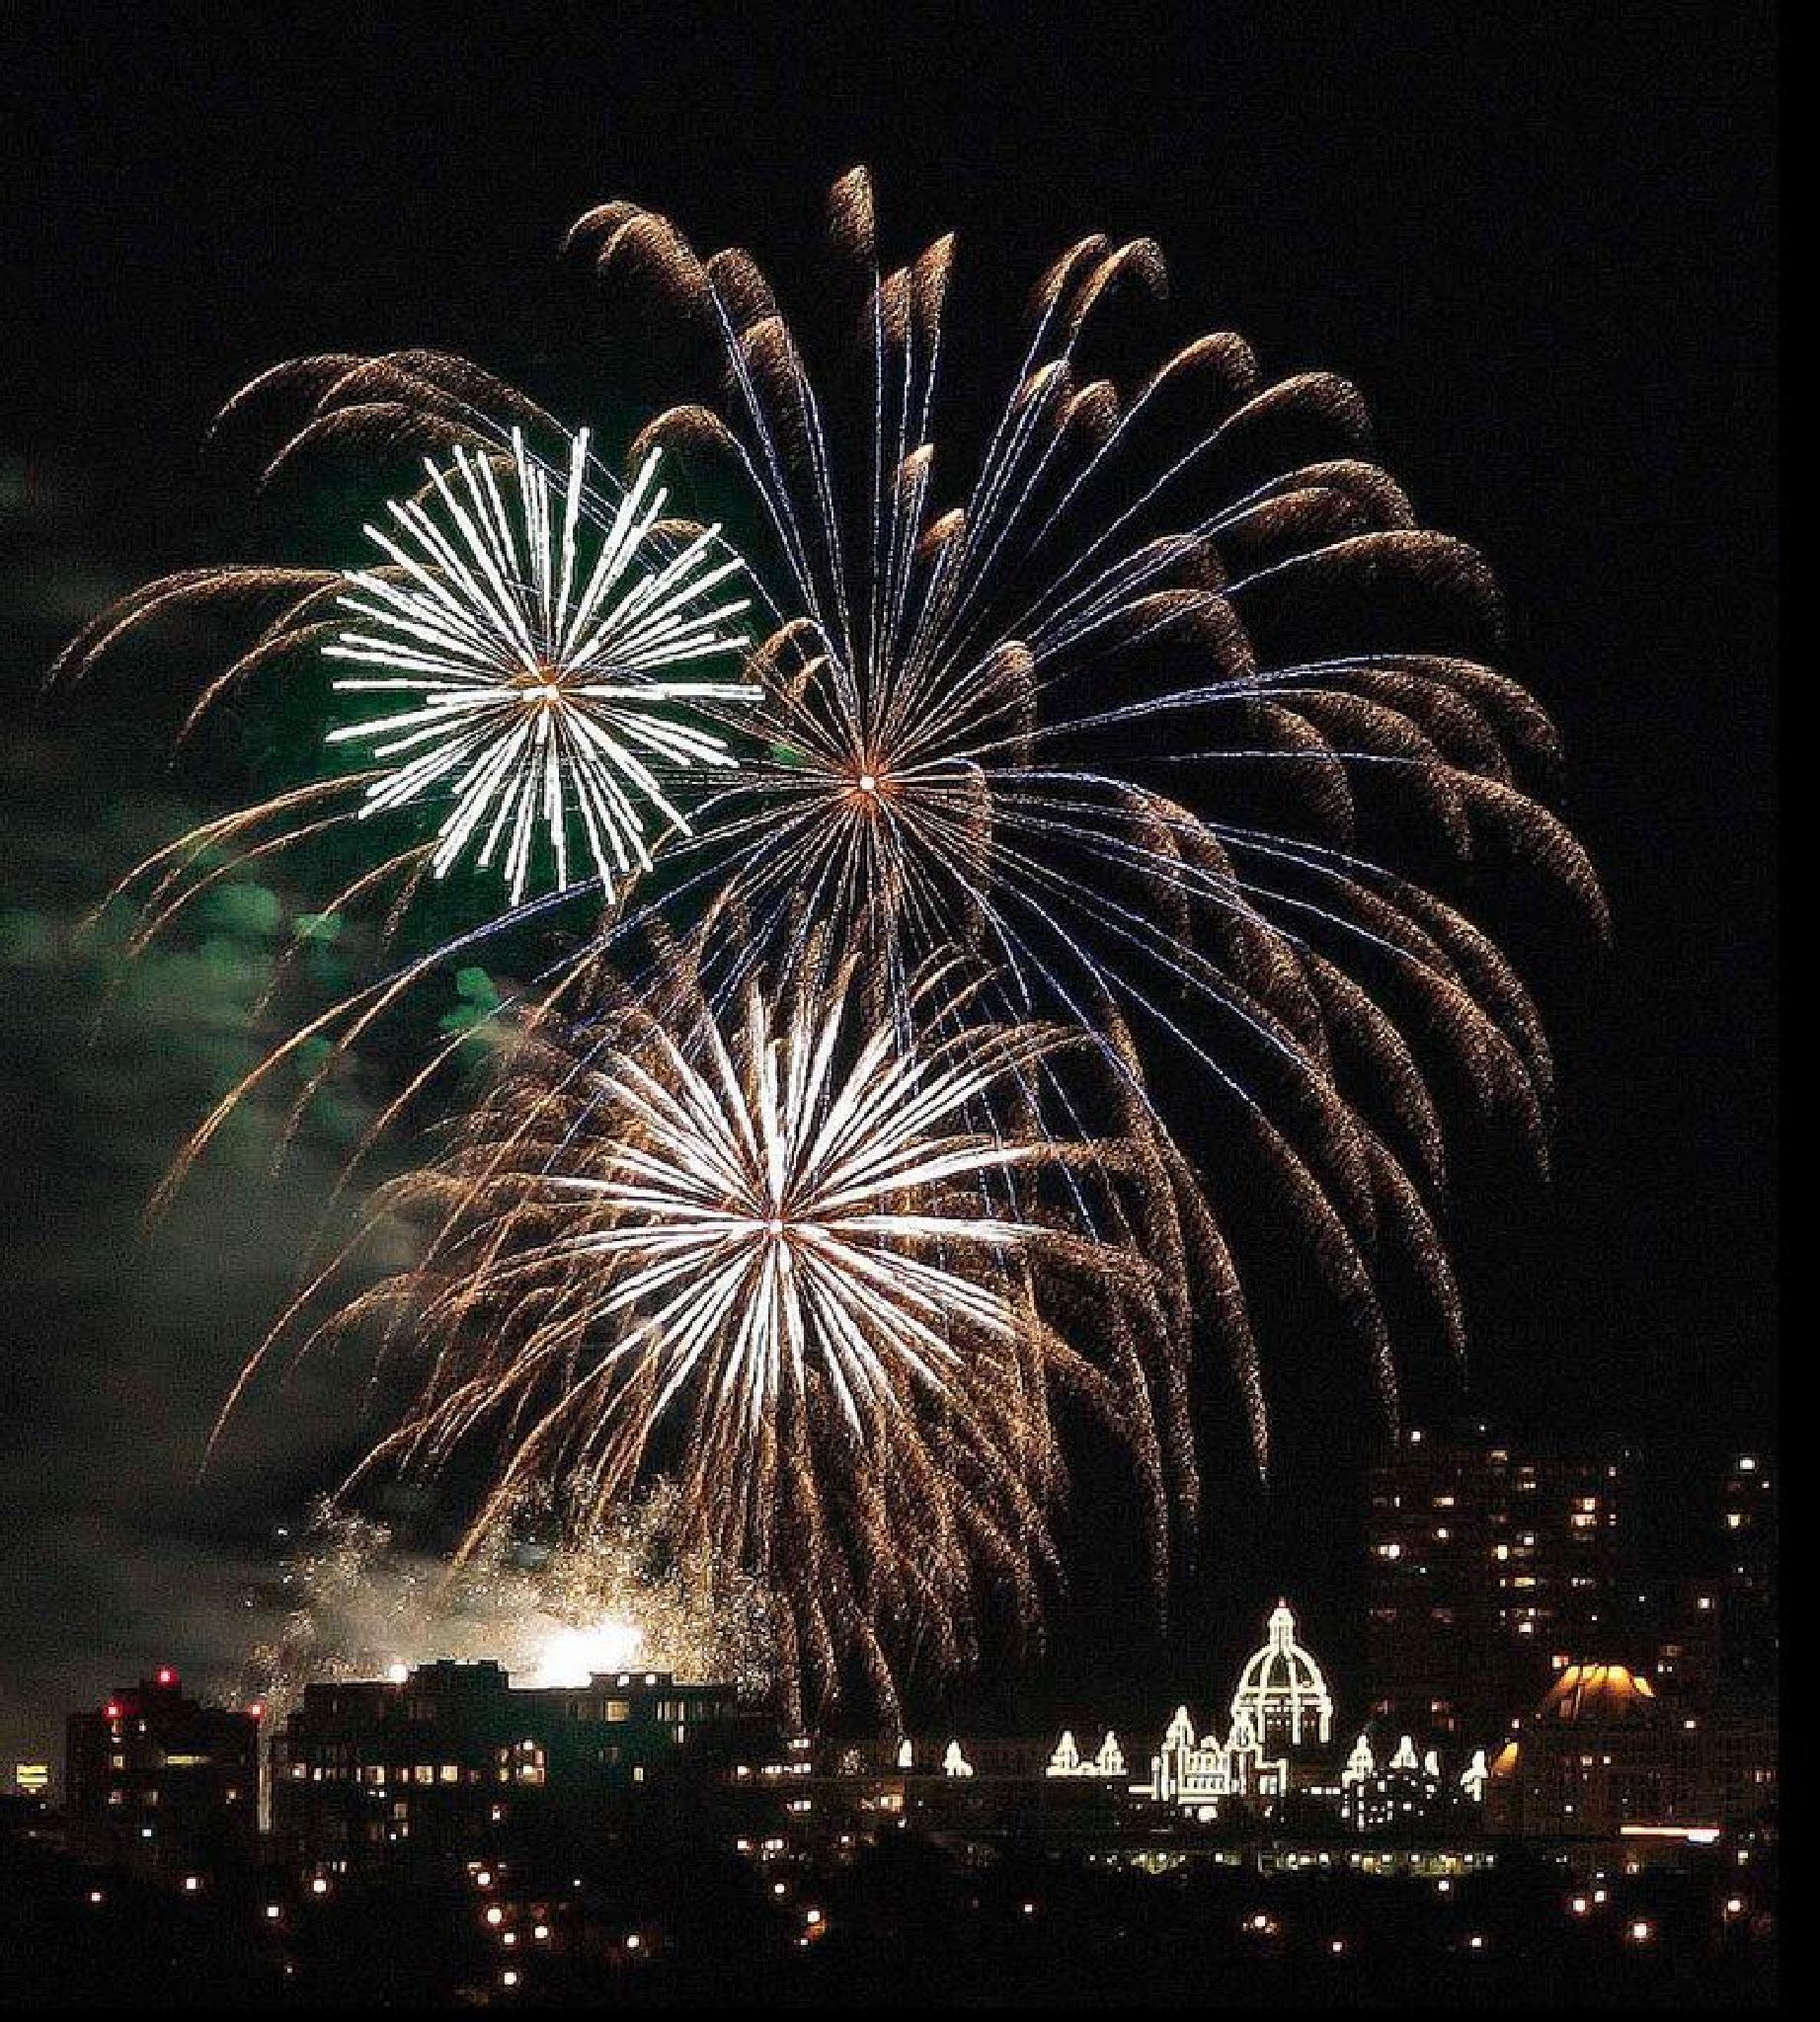 Canada Day FireWorks! by traraw